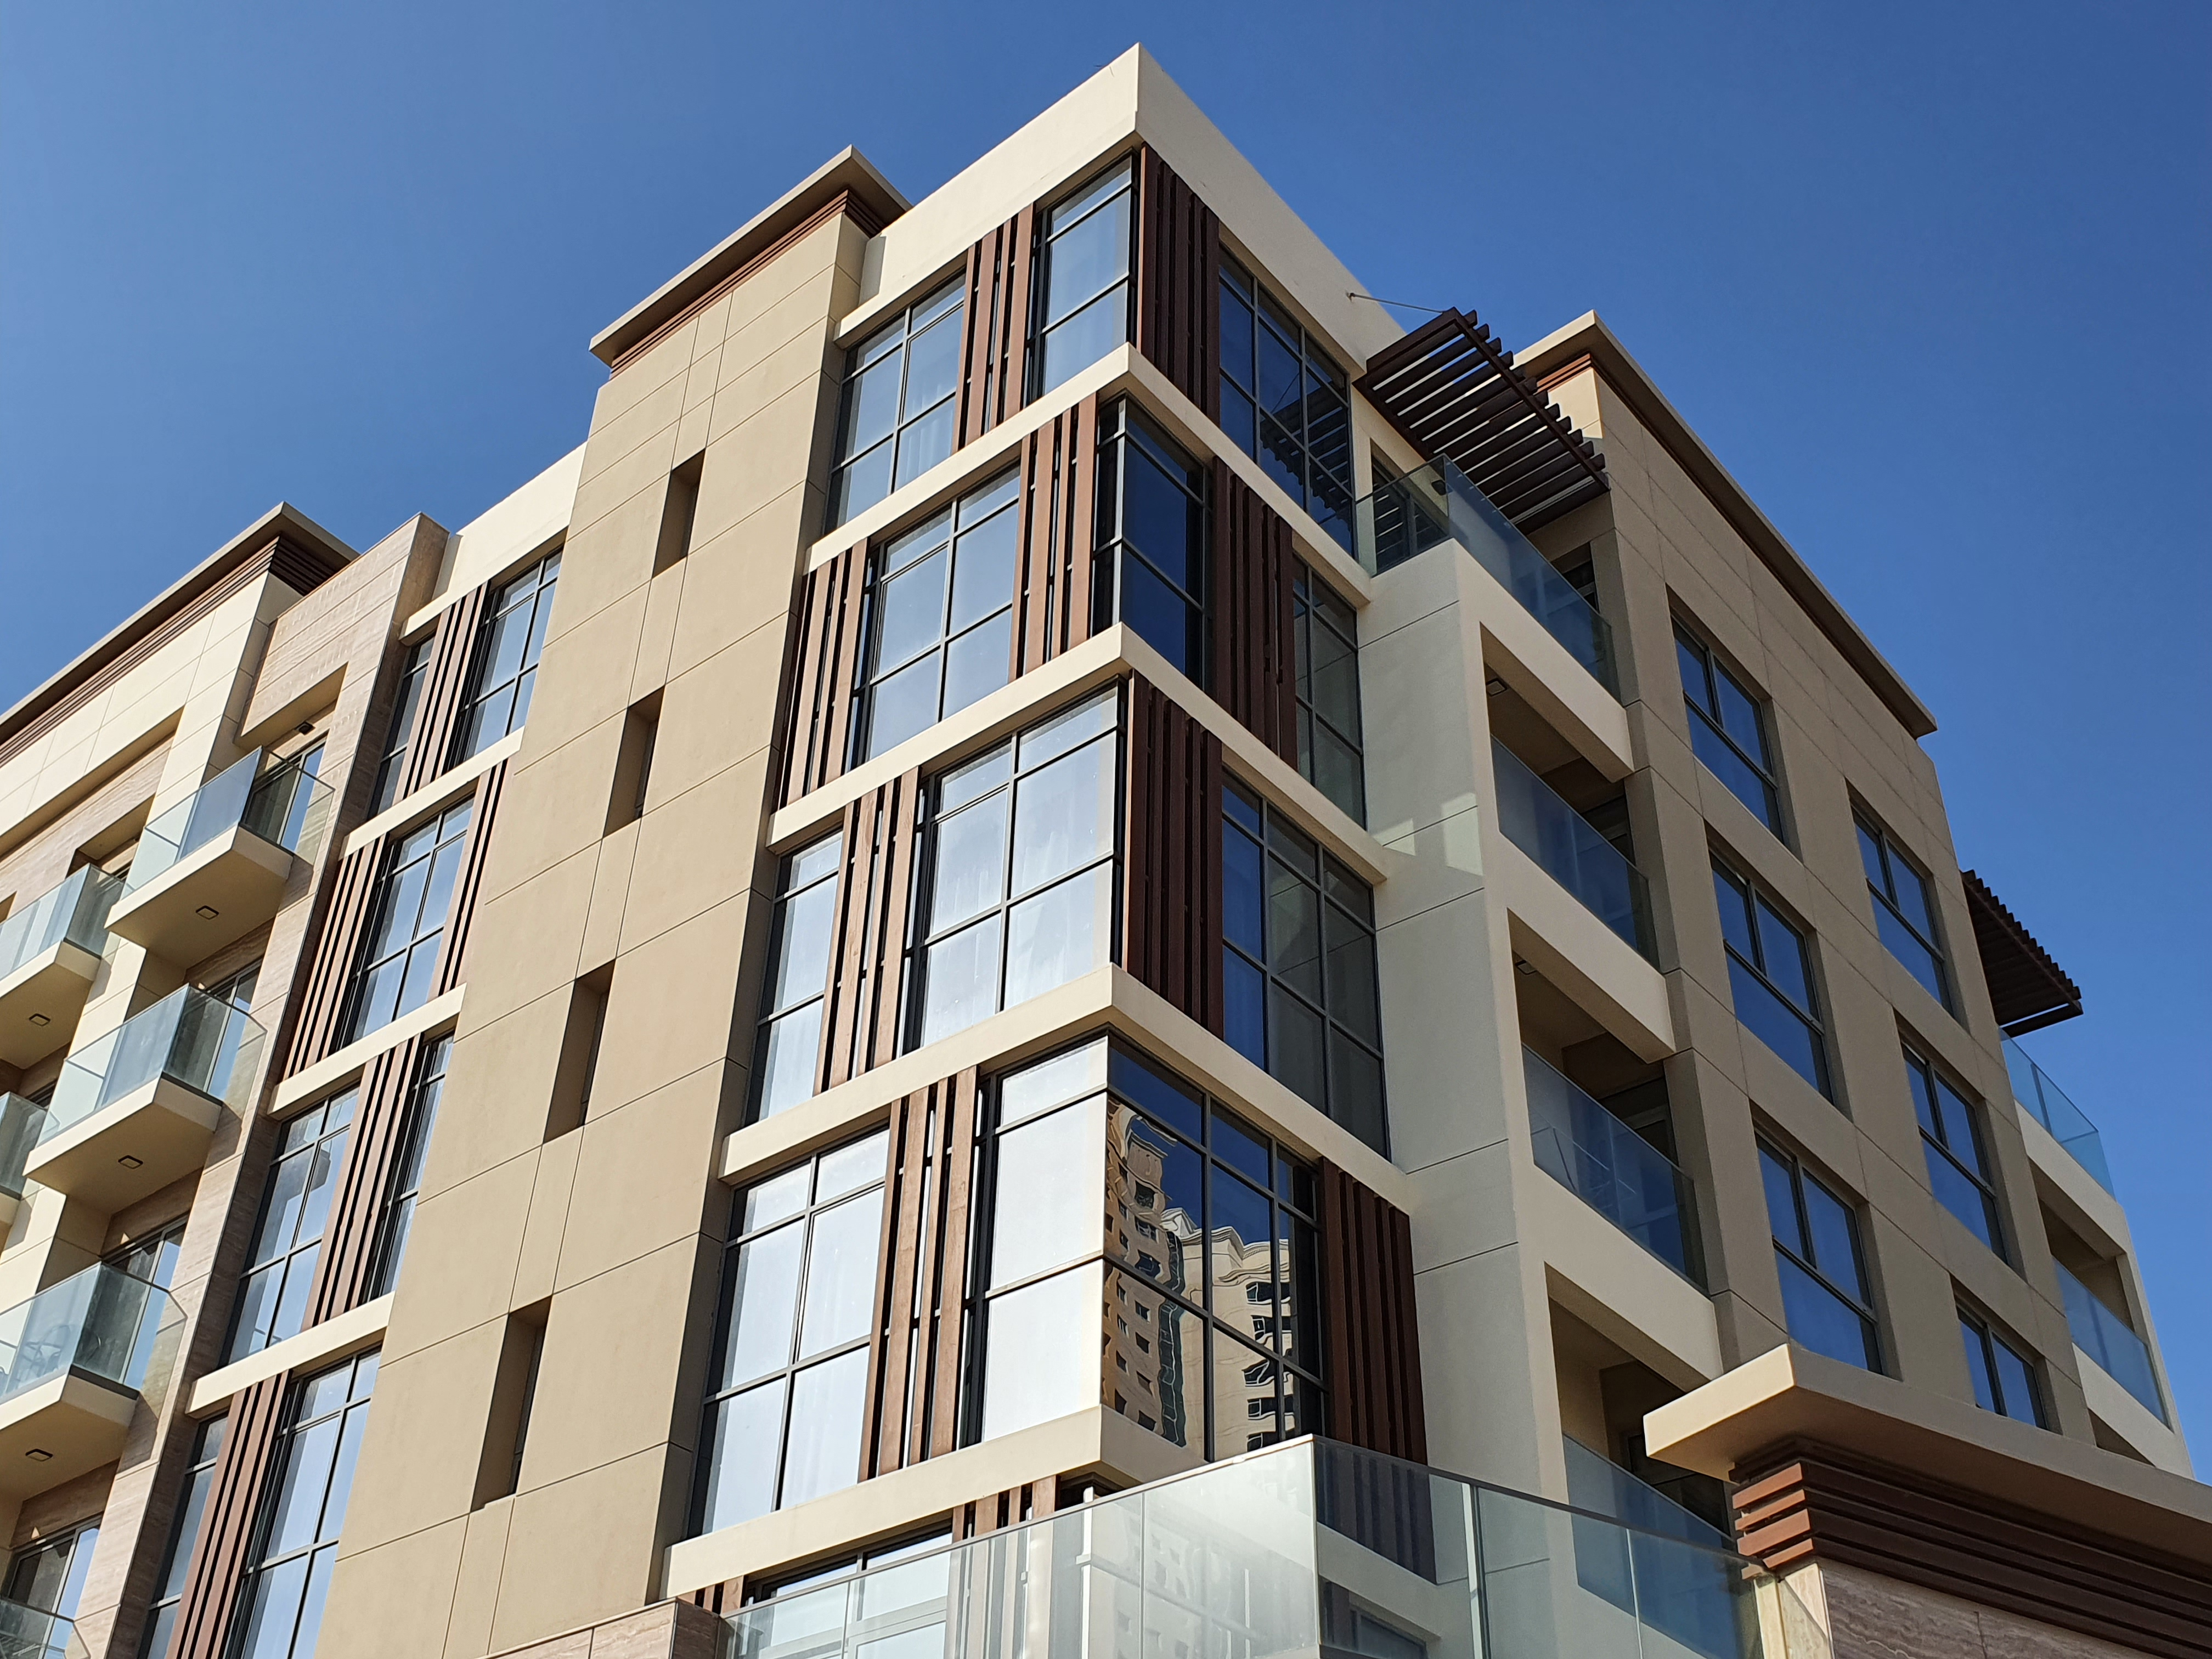 B+G+5 Typ – Commercial & Residential Building, Al Majan, Dubai